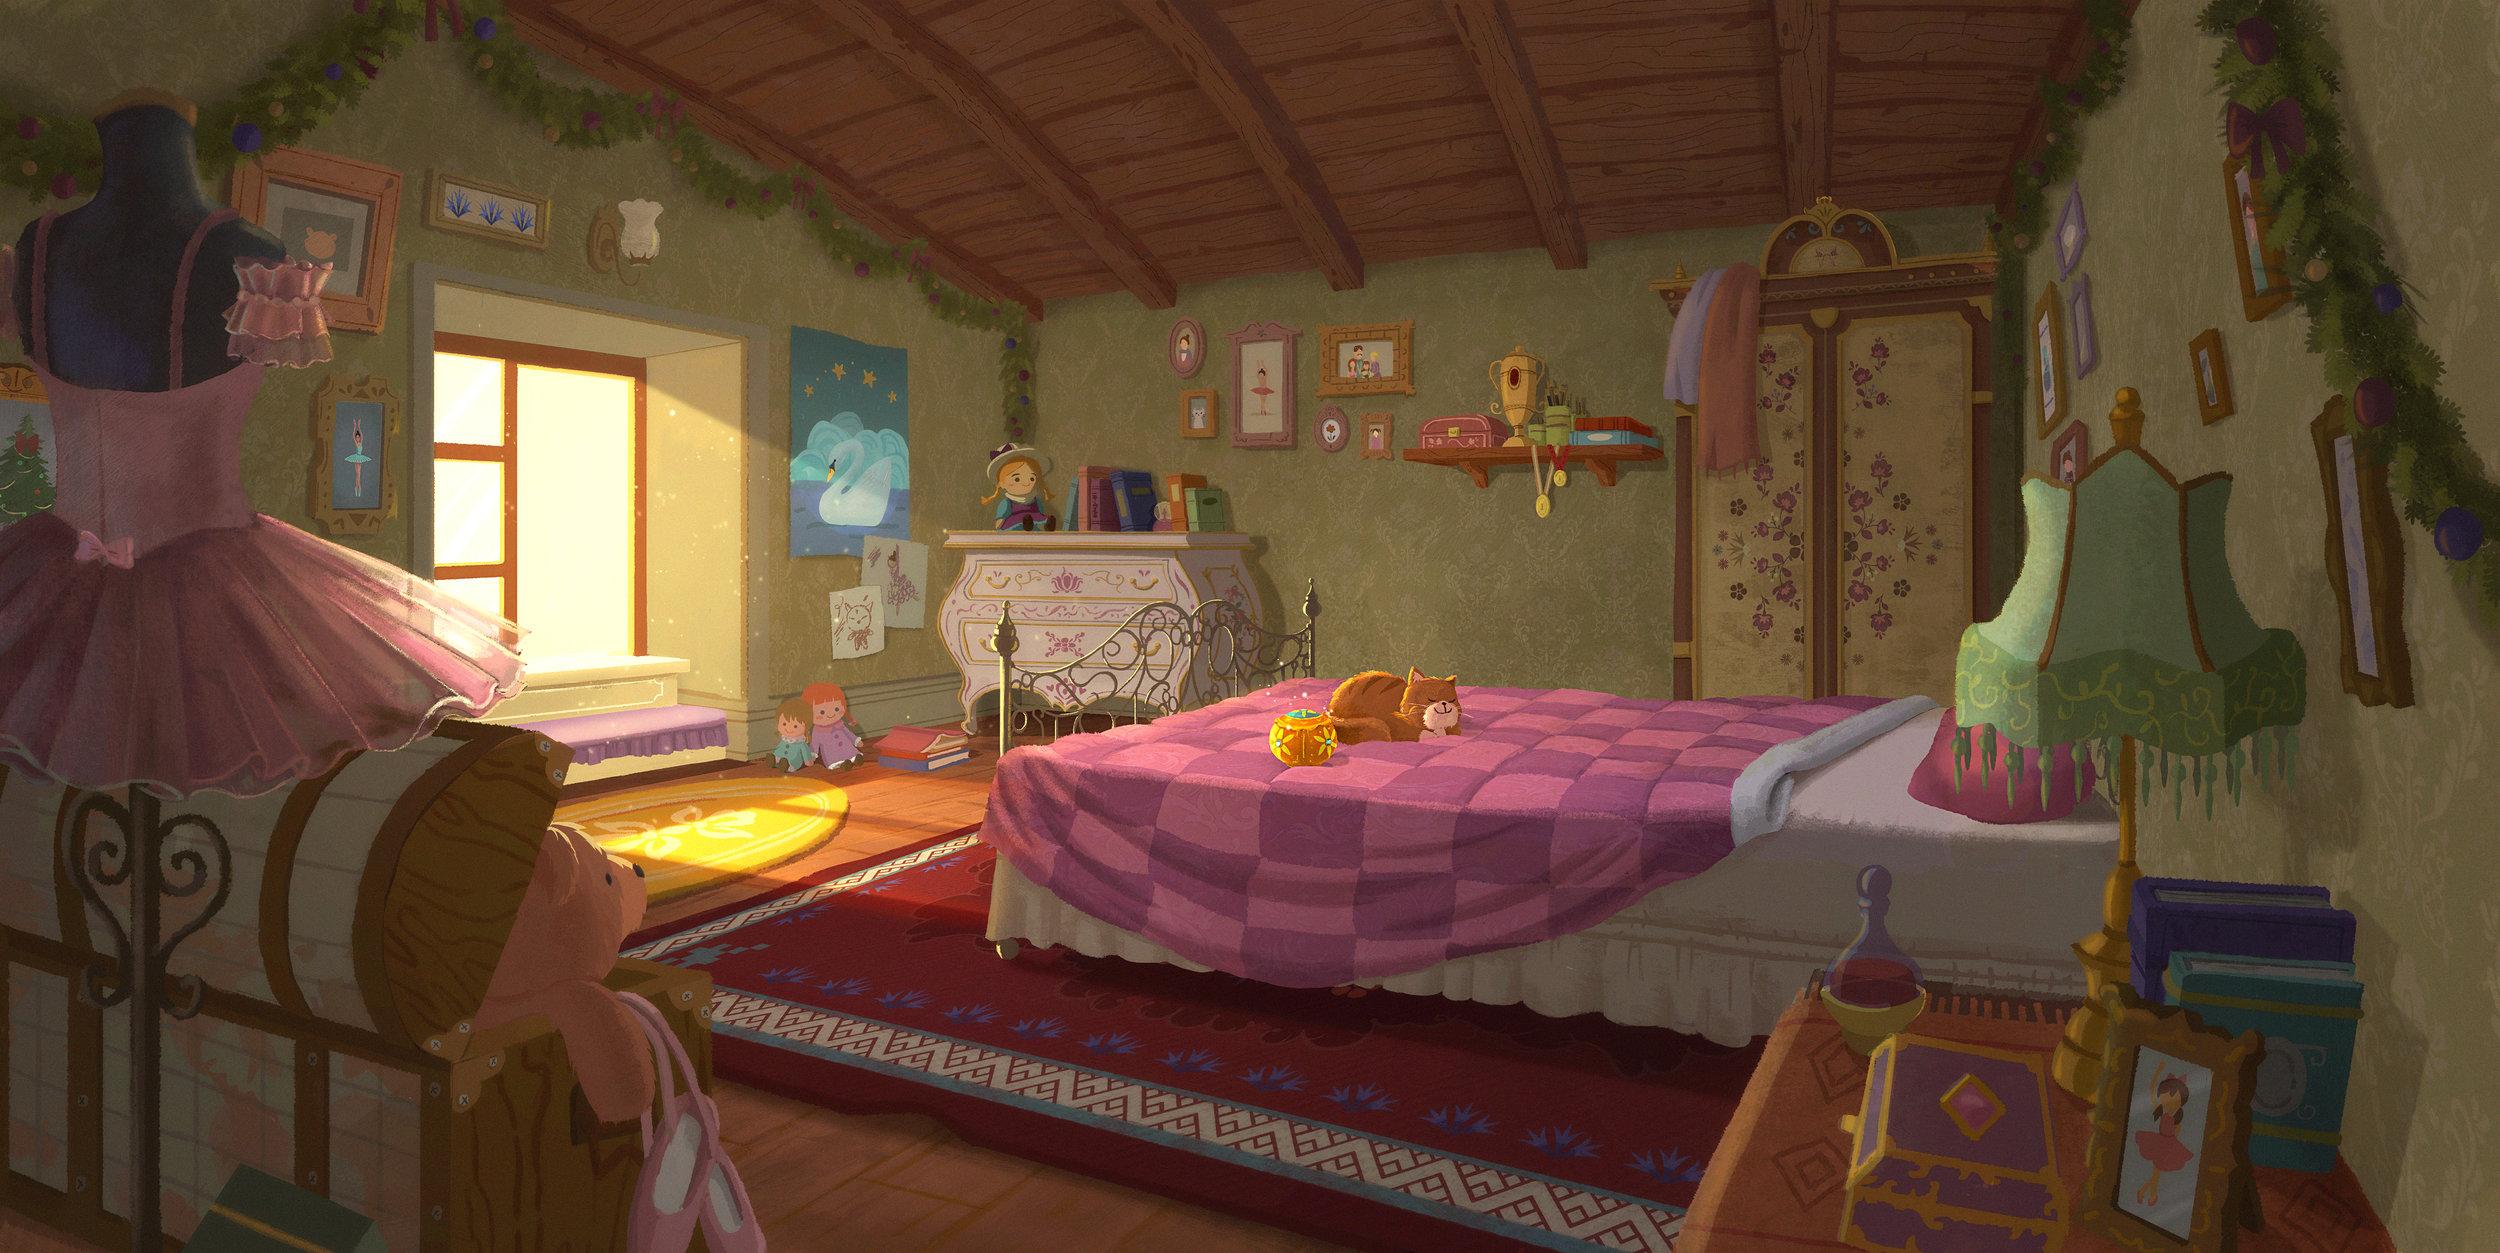 Soyun Park / The Nutcracker / Clara's room